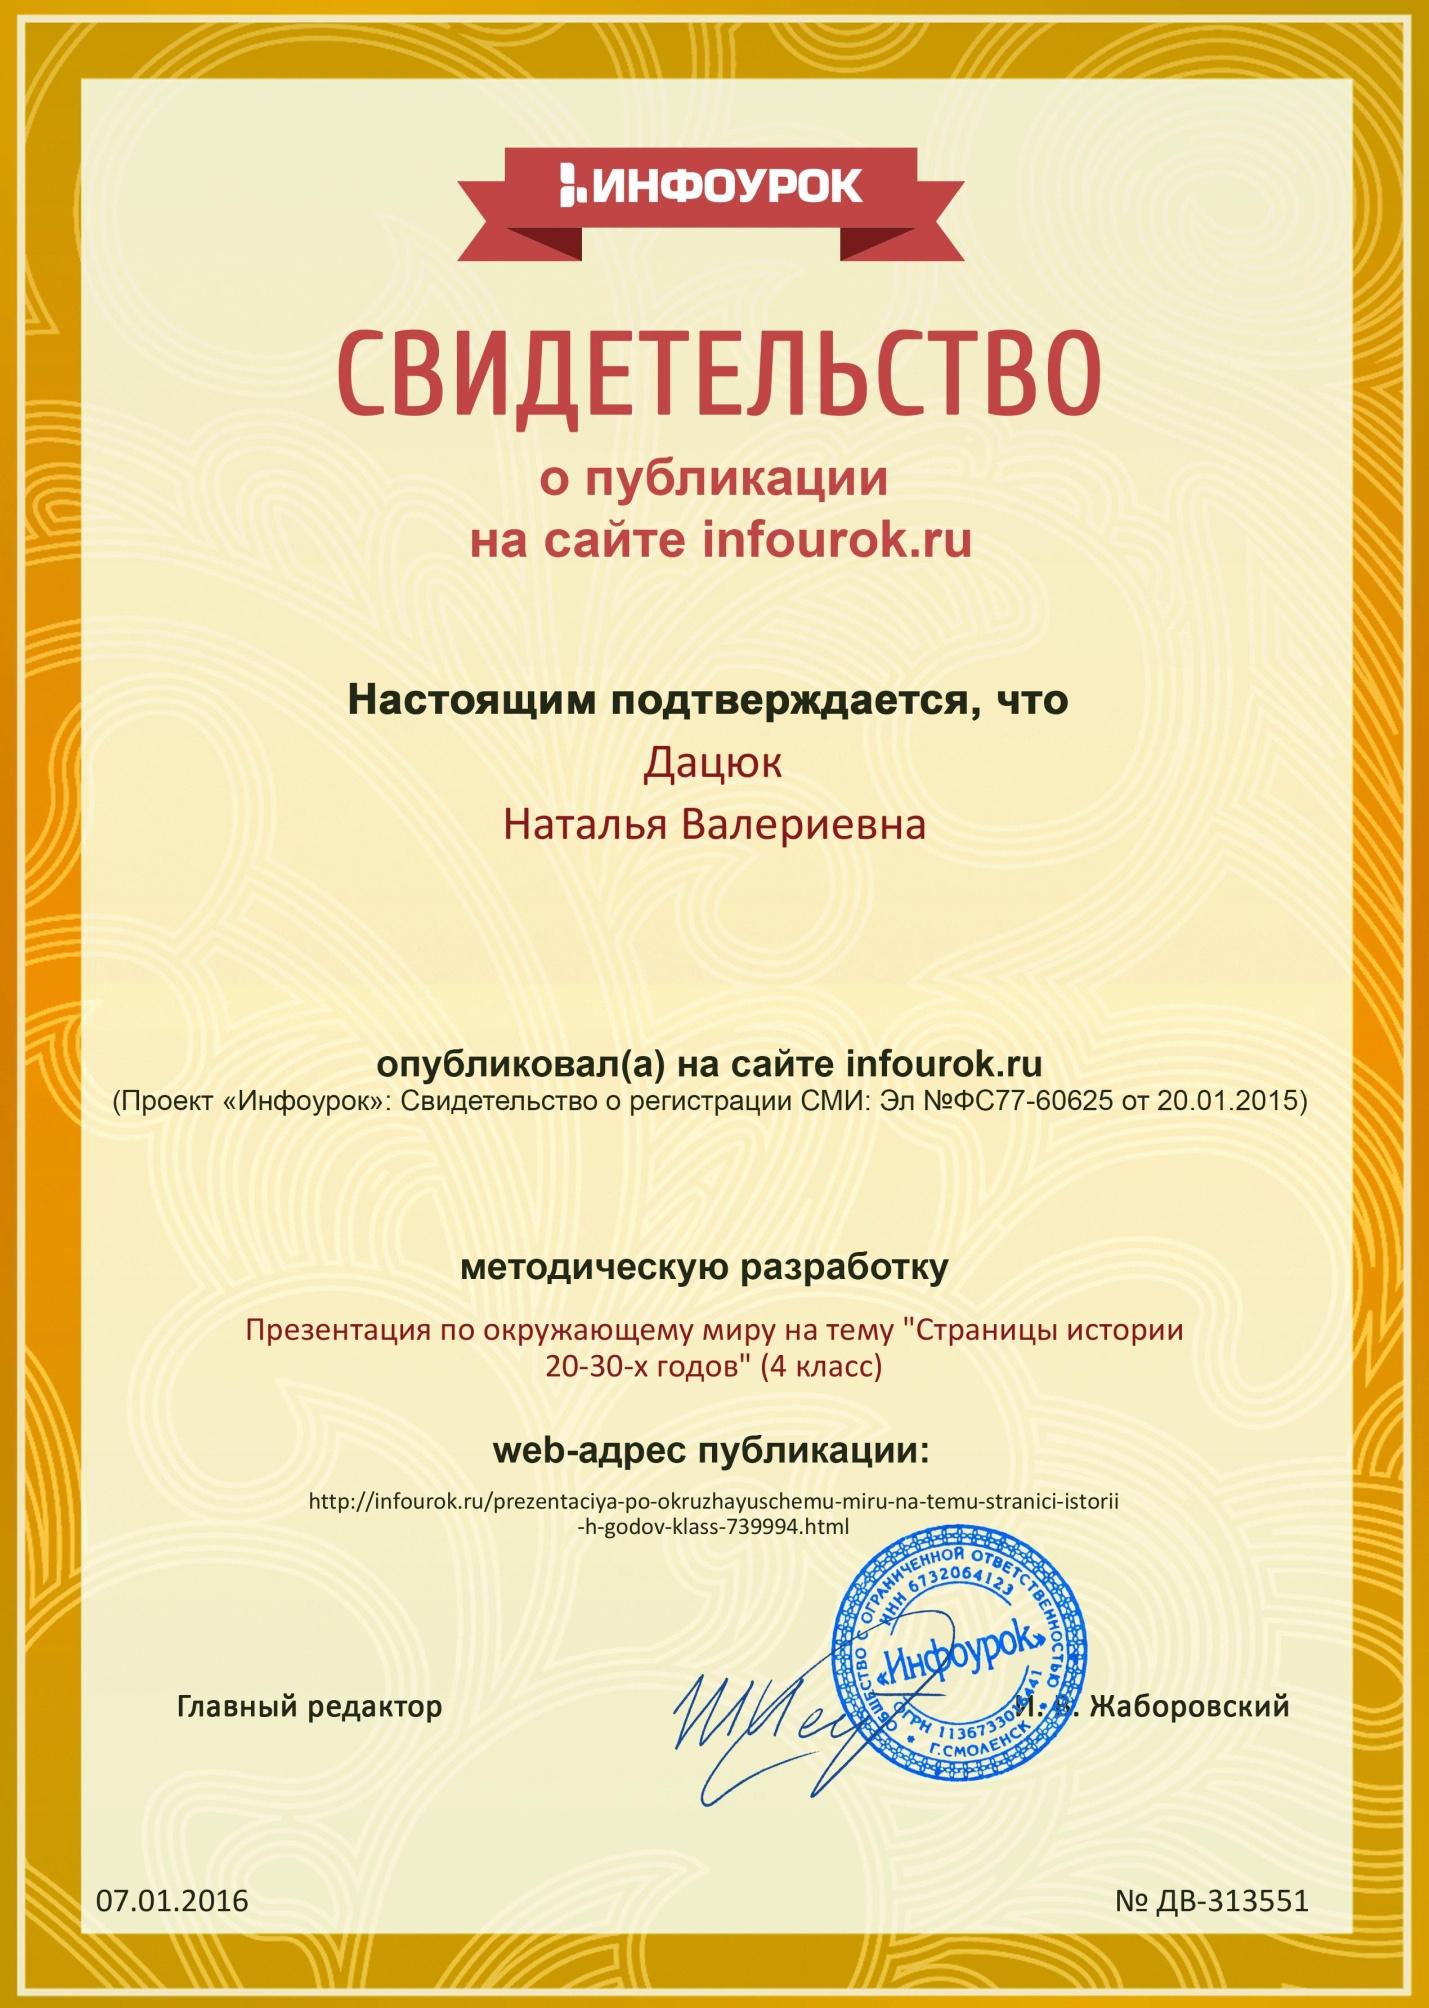 Сертификат проекта infourok.ru № ДВ-313551.jpg